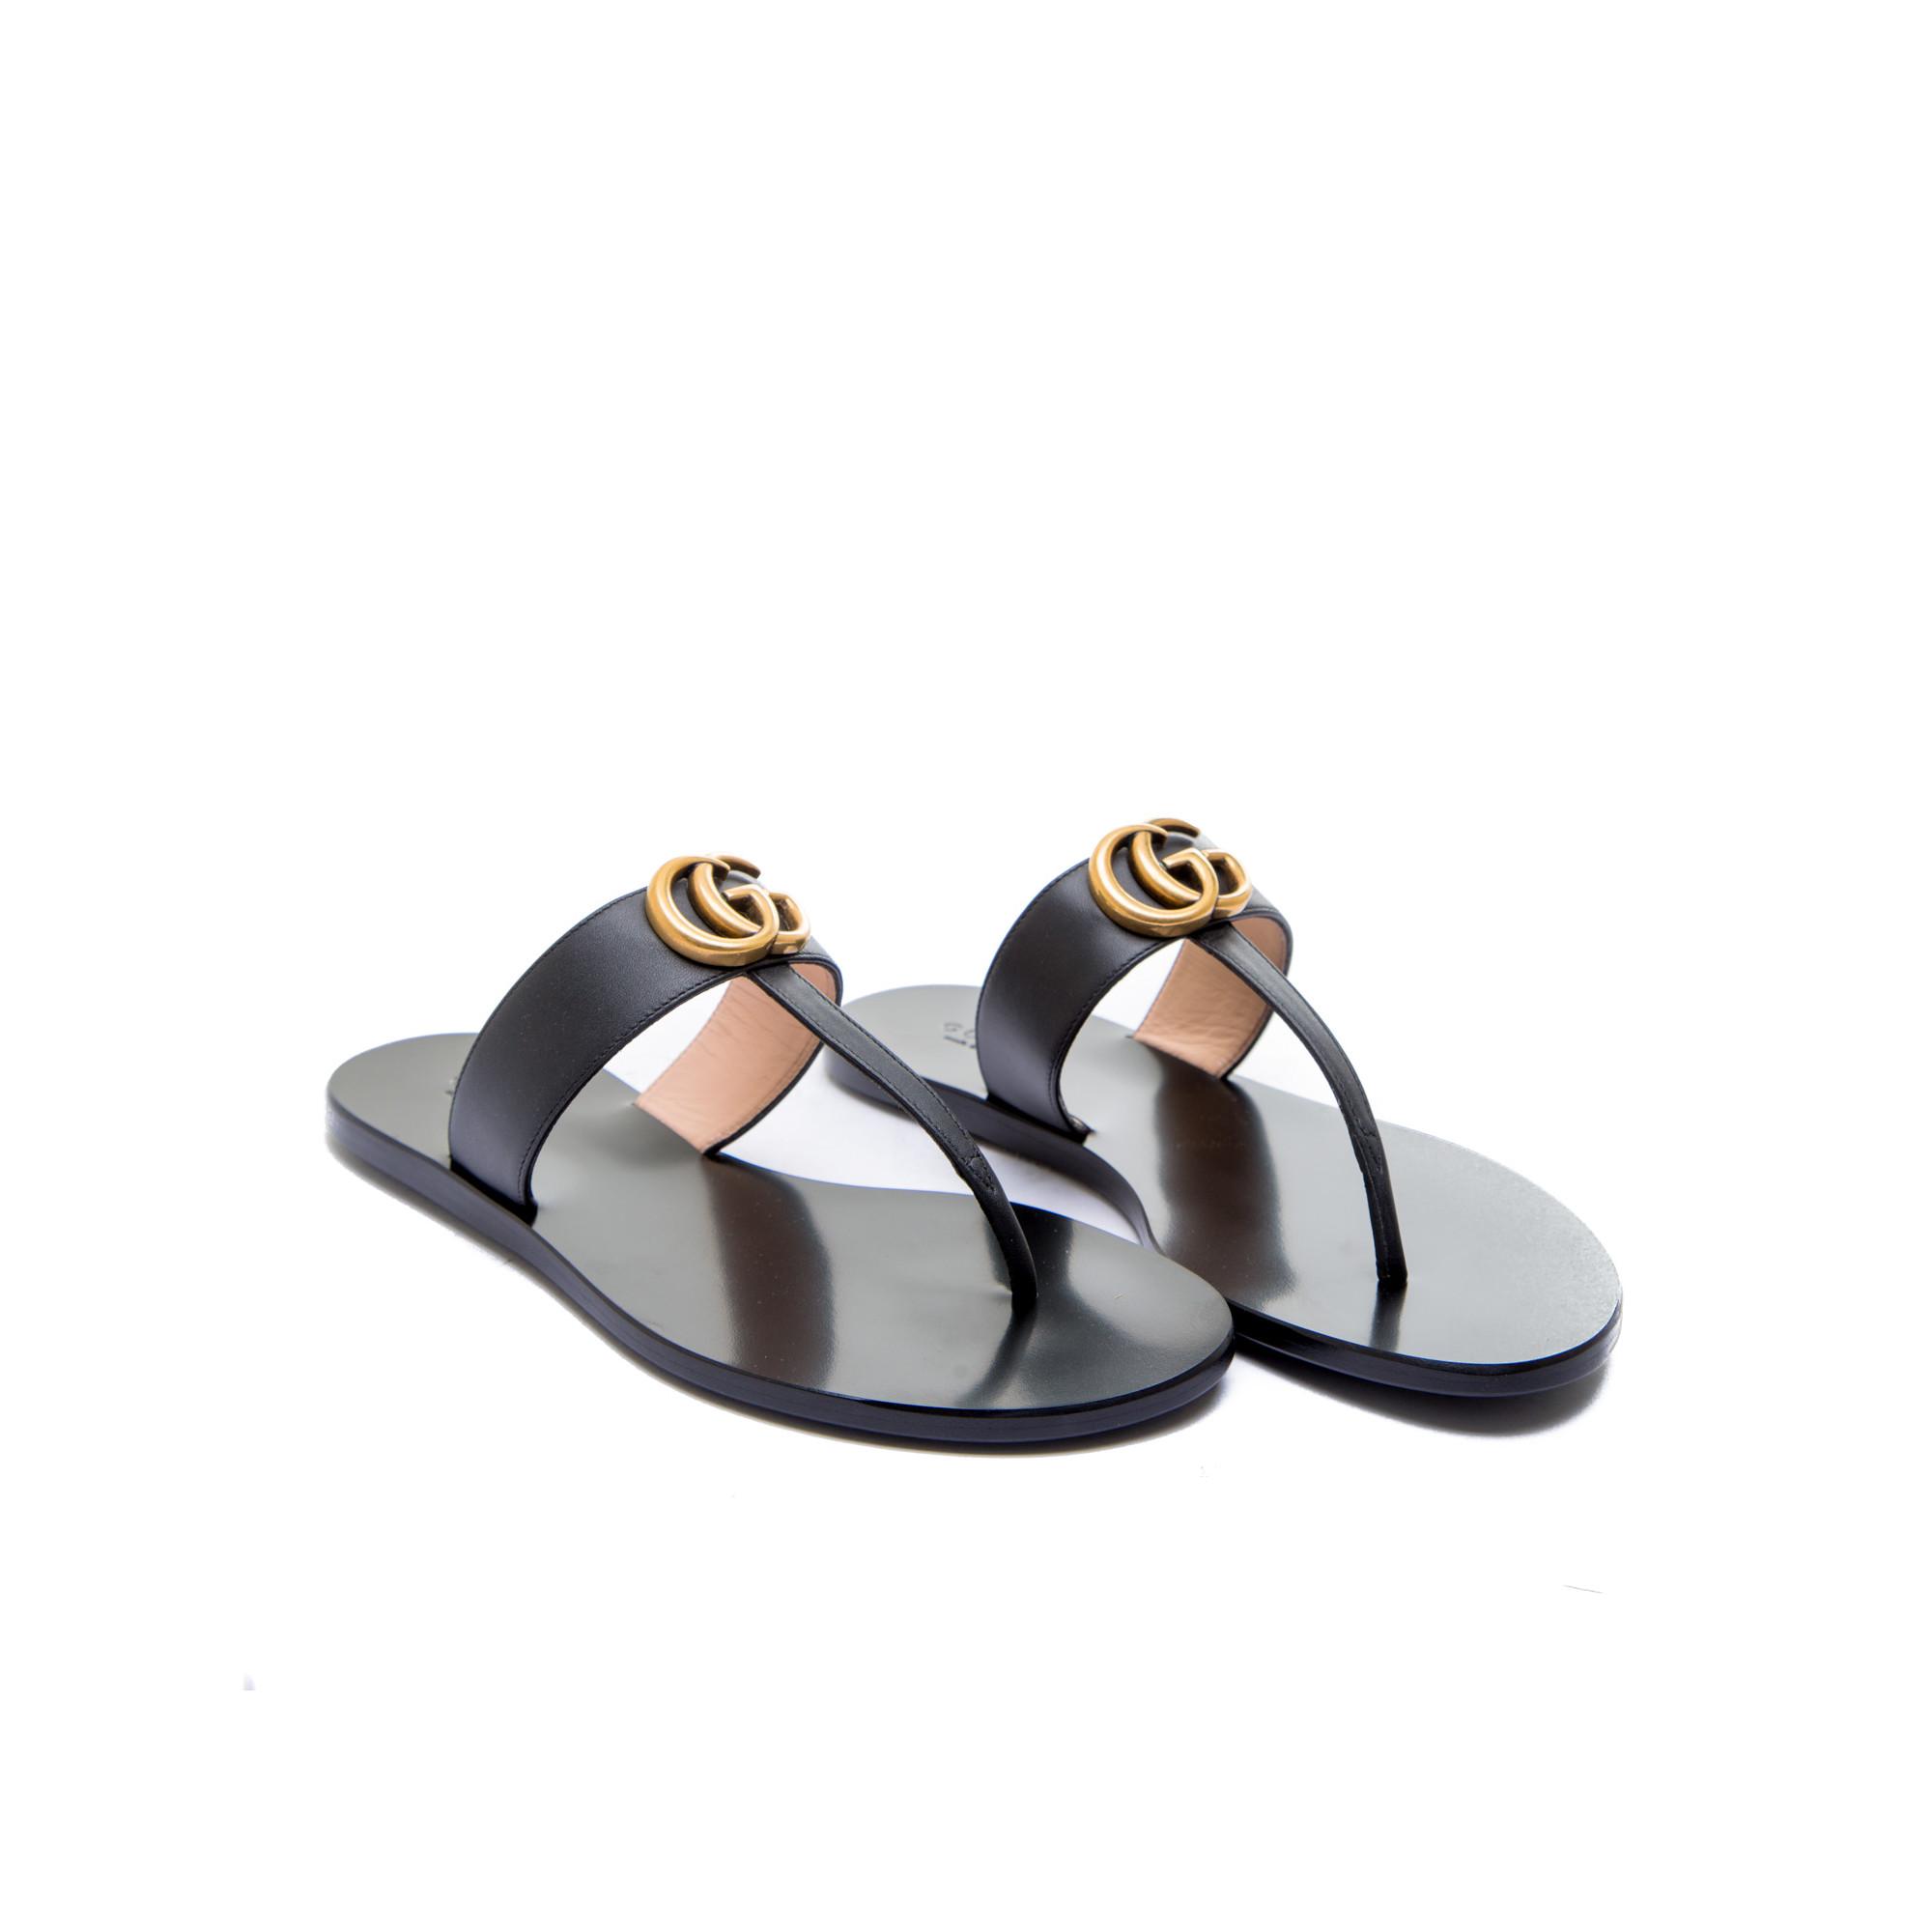 f273430df ... Gucci sandals lifford black Gucci sandals lifford black - www. derodeloper.com - Derodeloper ...